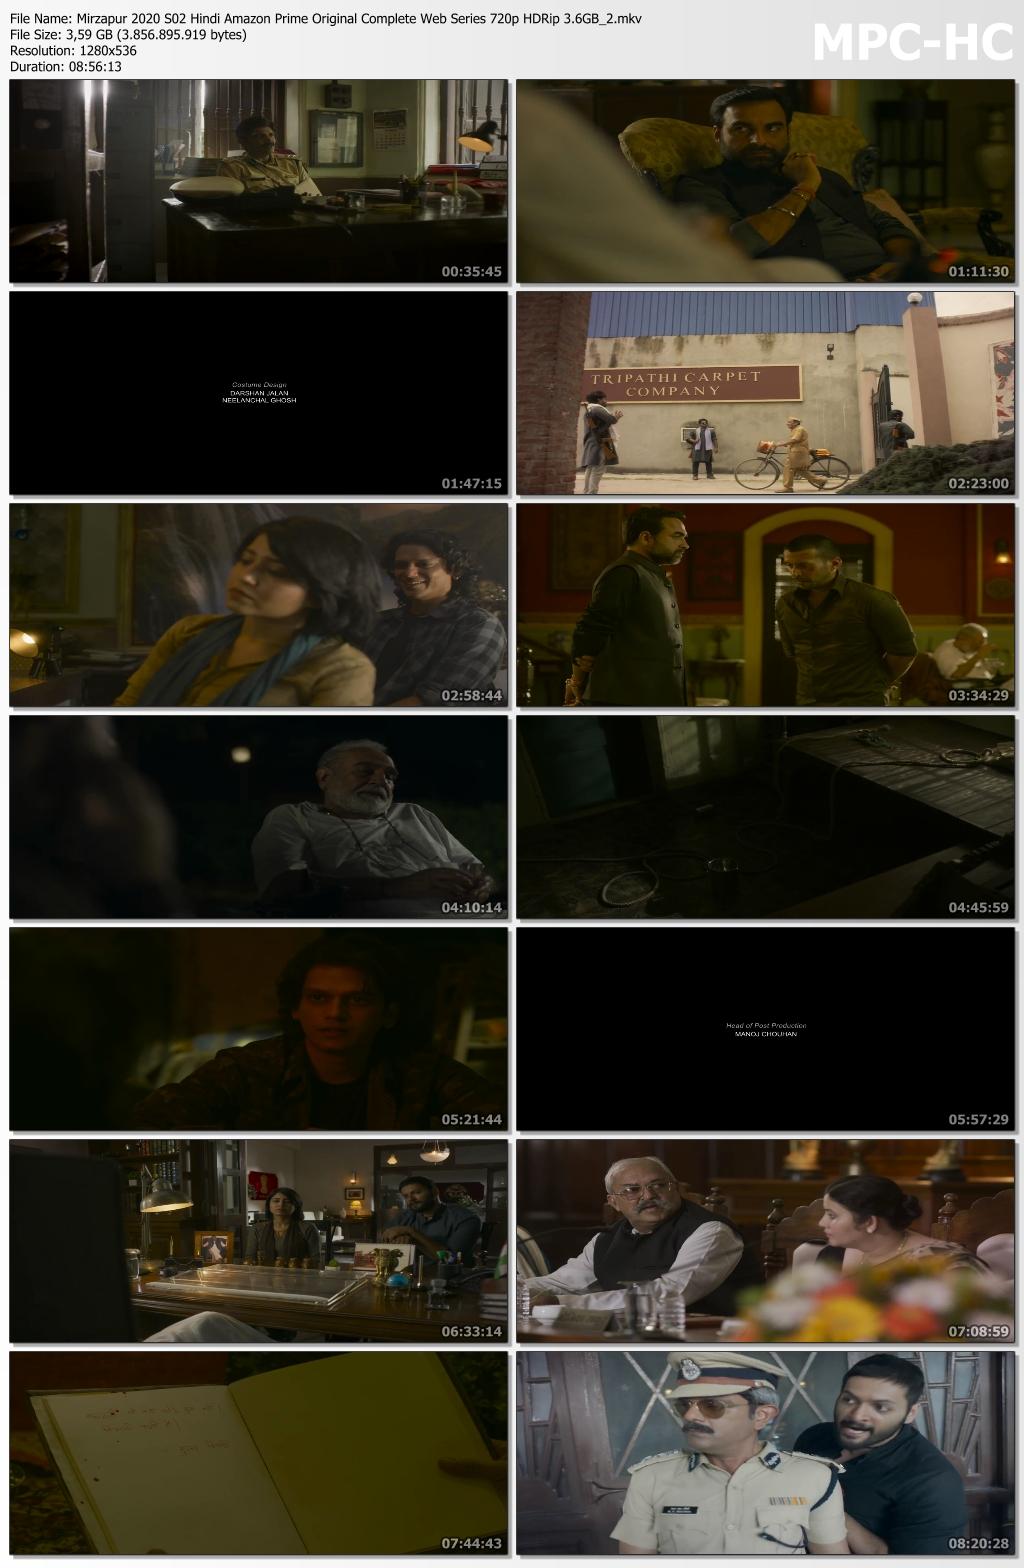 Mirzapur-2020-S02-Hindi-Amazon-Prime-Original-Complete-Web-Series-720p-HDRip-3-6-GB-2-mkv-thumbs